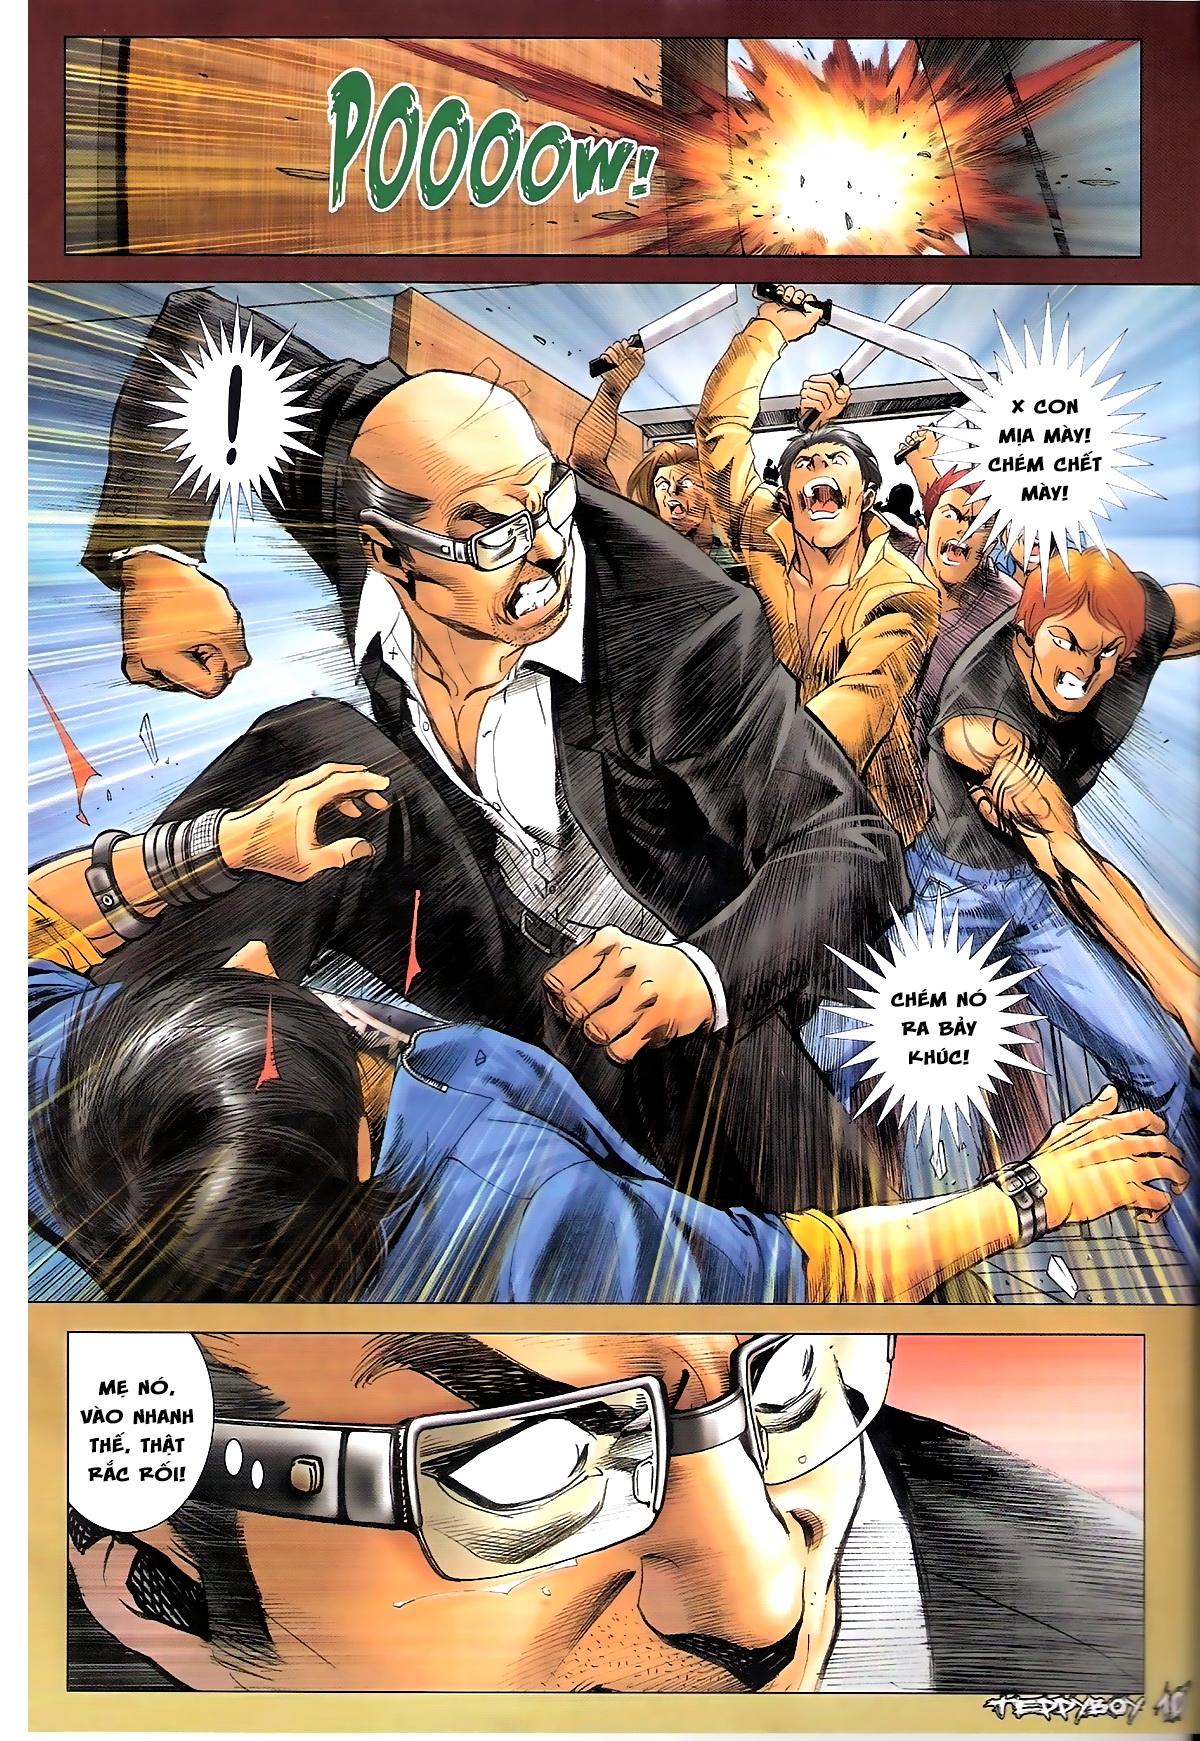 Người Trong Giang Hồ - Chapter 1317: Tao phải thắng lão - Pic 8